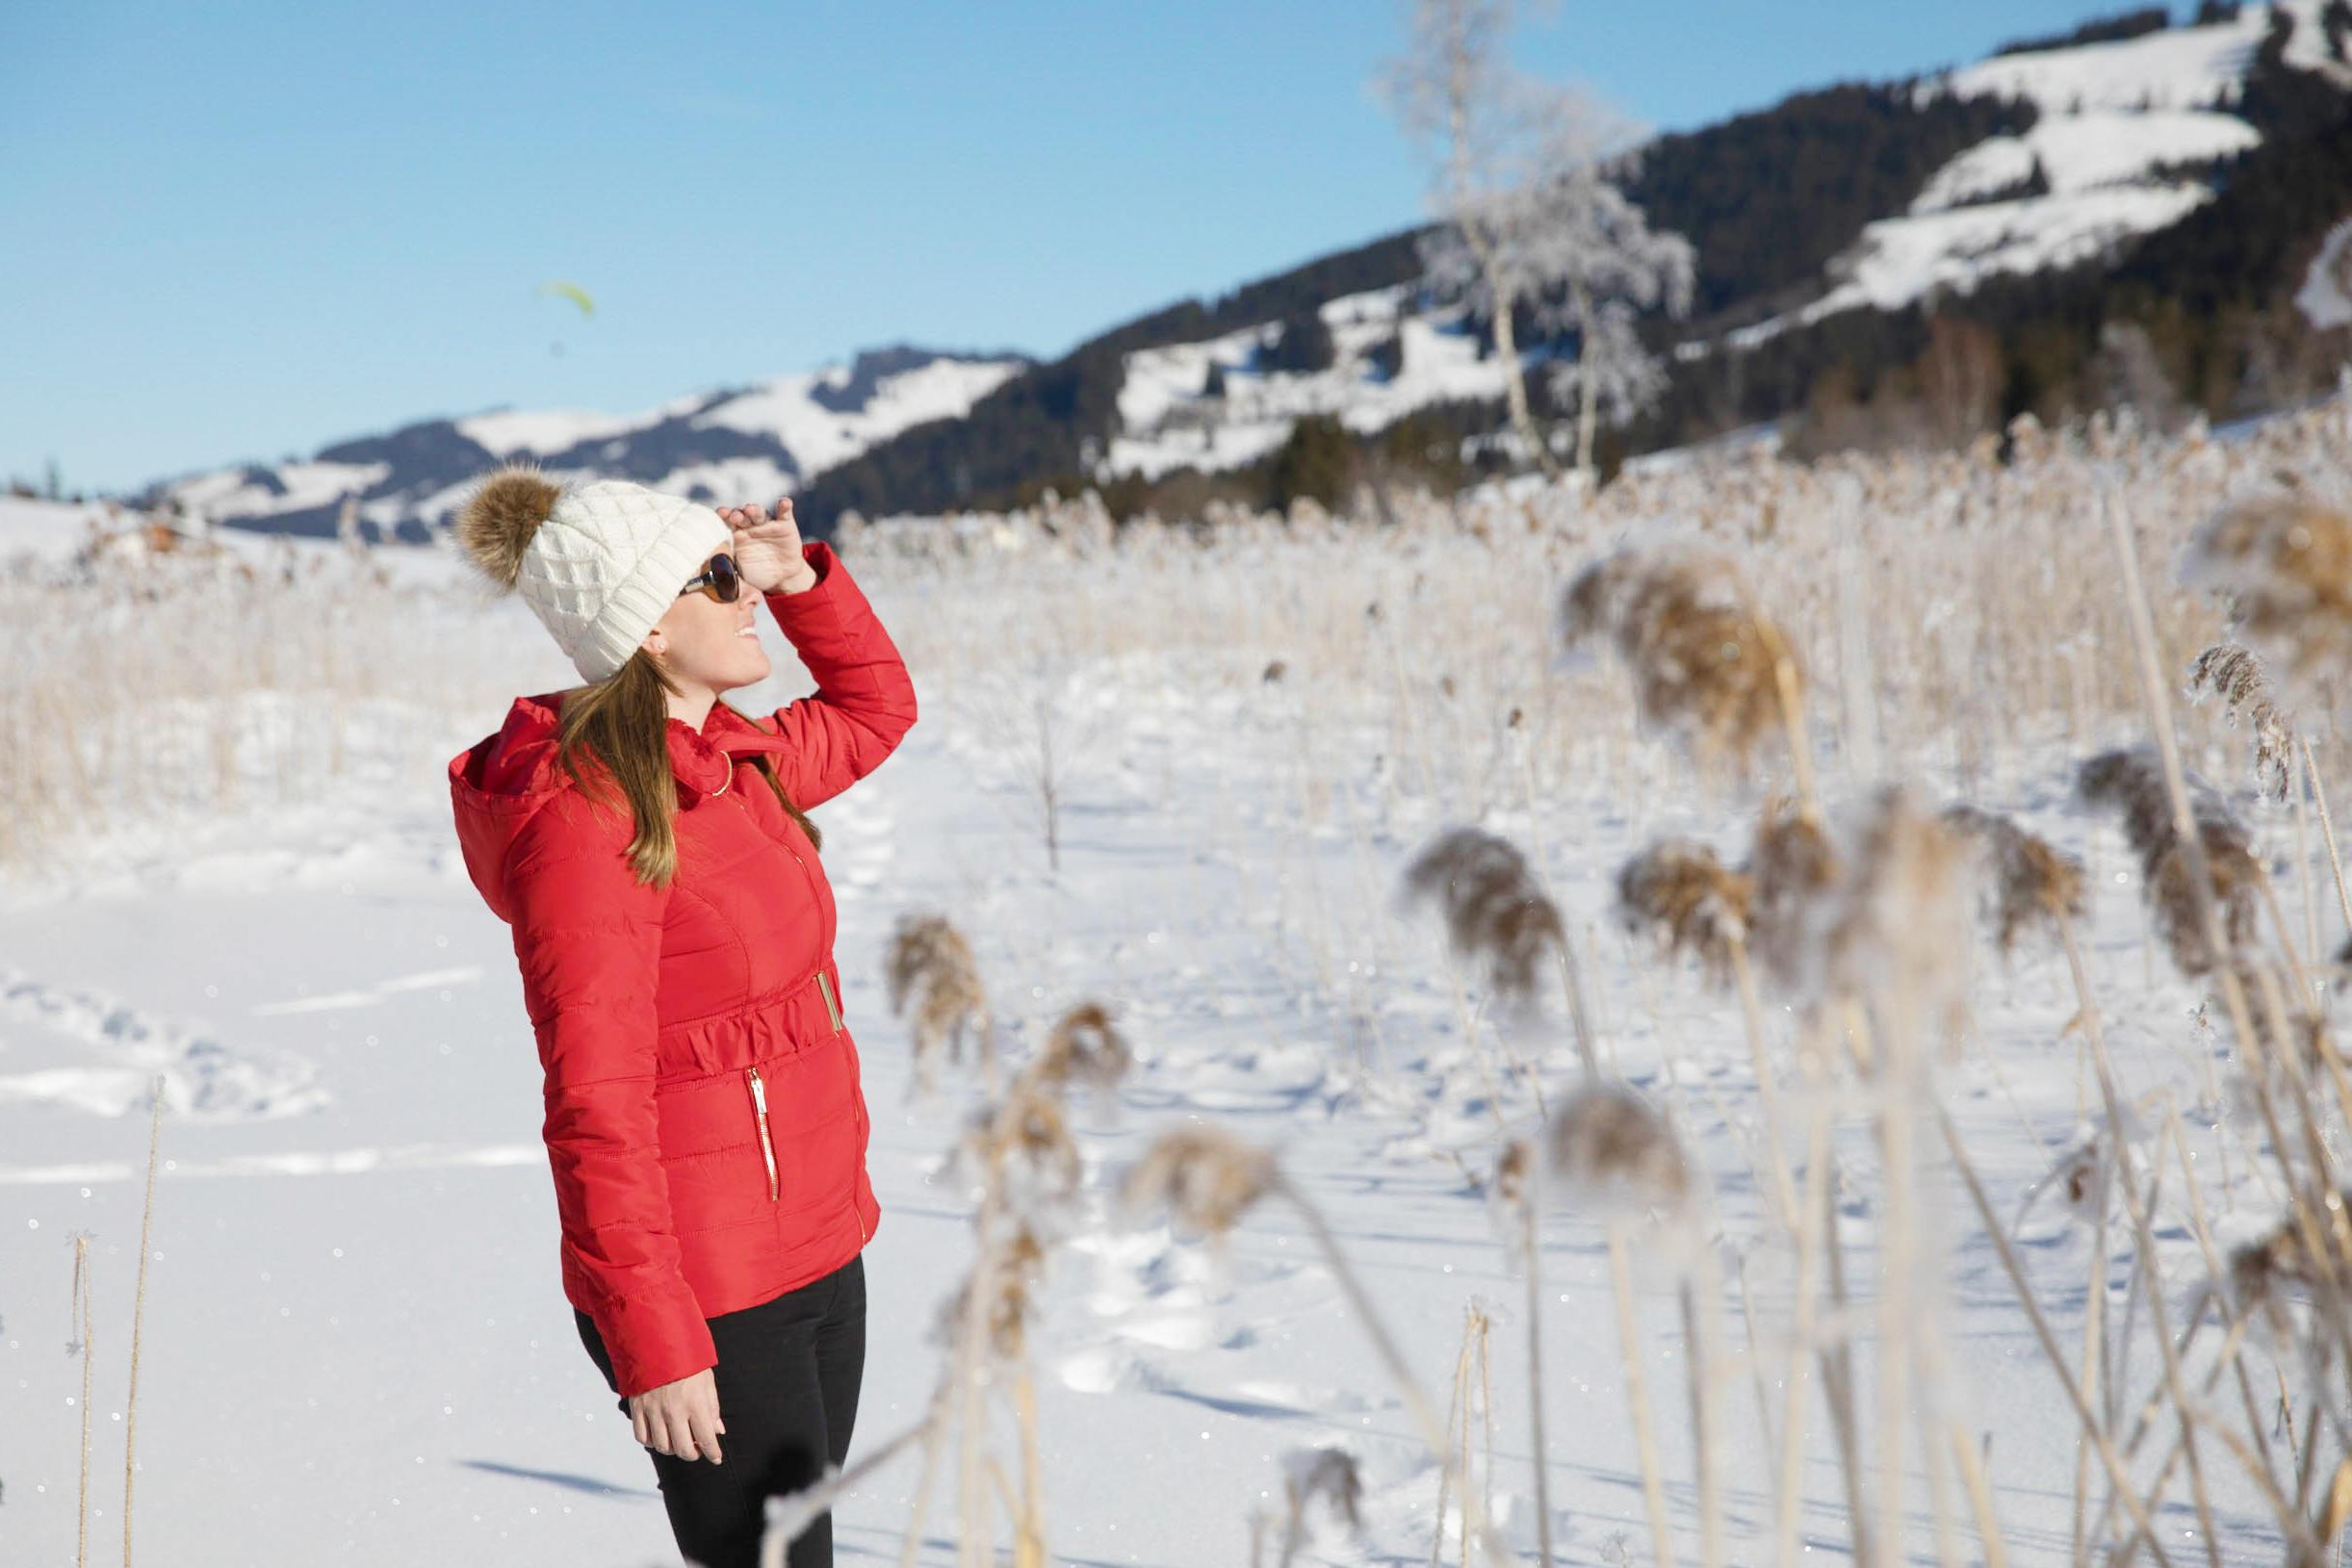 schwarzsee-frozen-lake-weather-something-swiss-switzerland.jpg